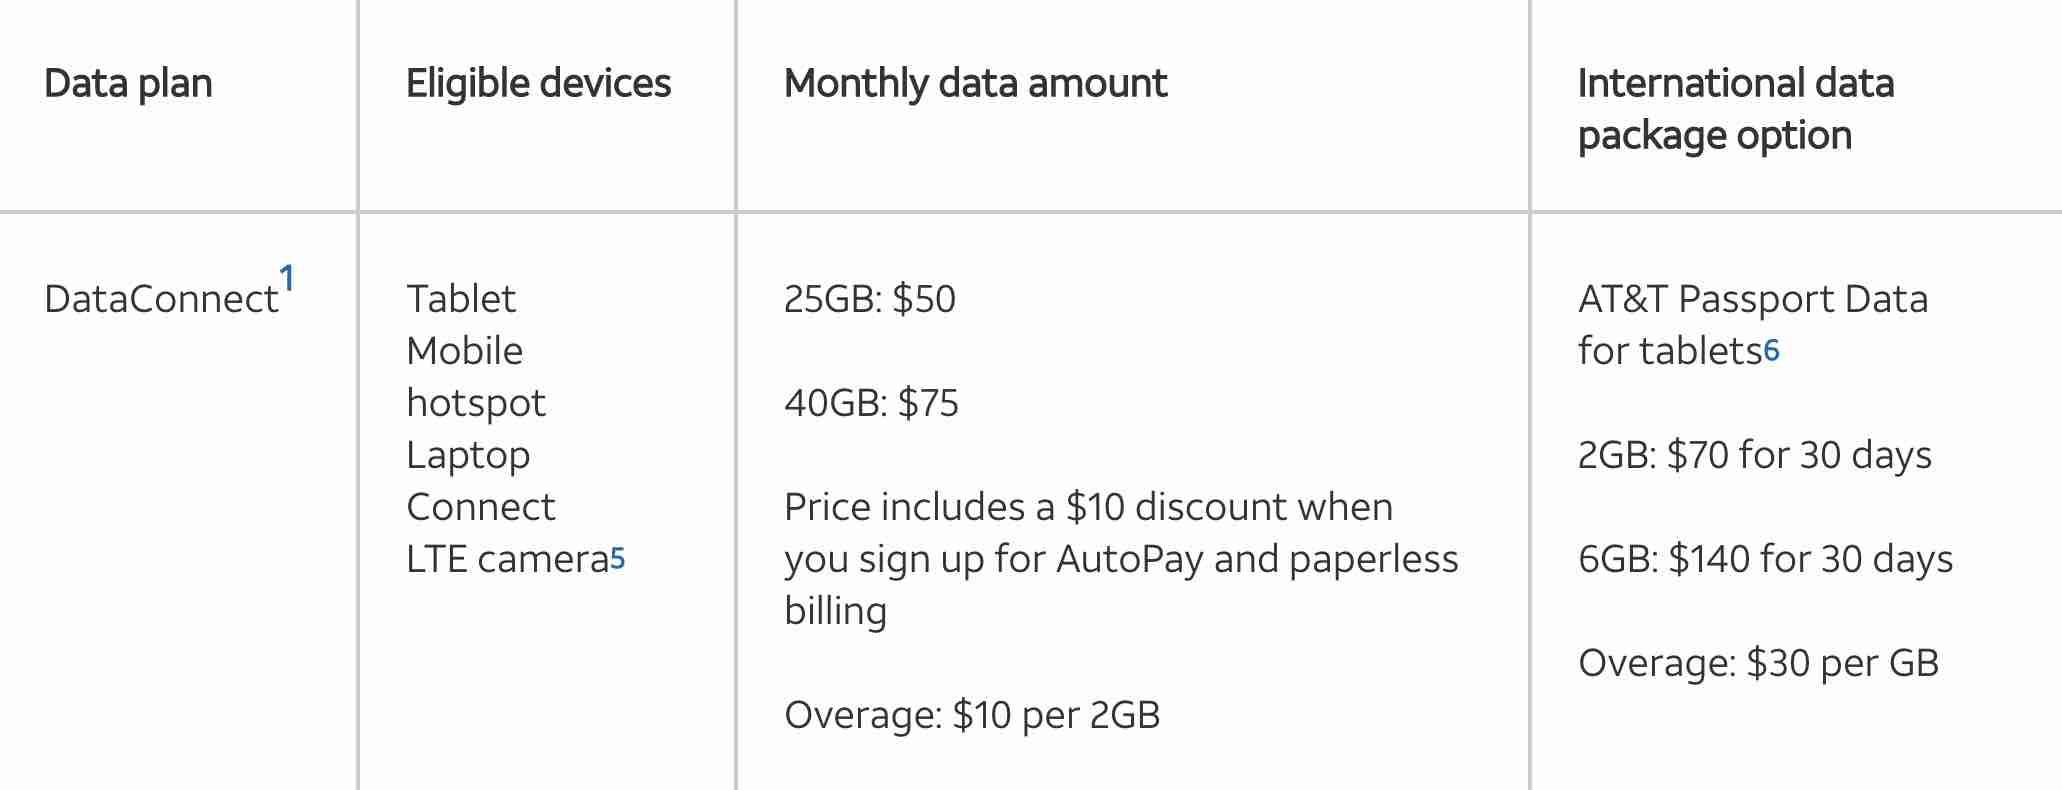 AT&T's DataConnect plan details